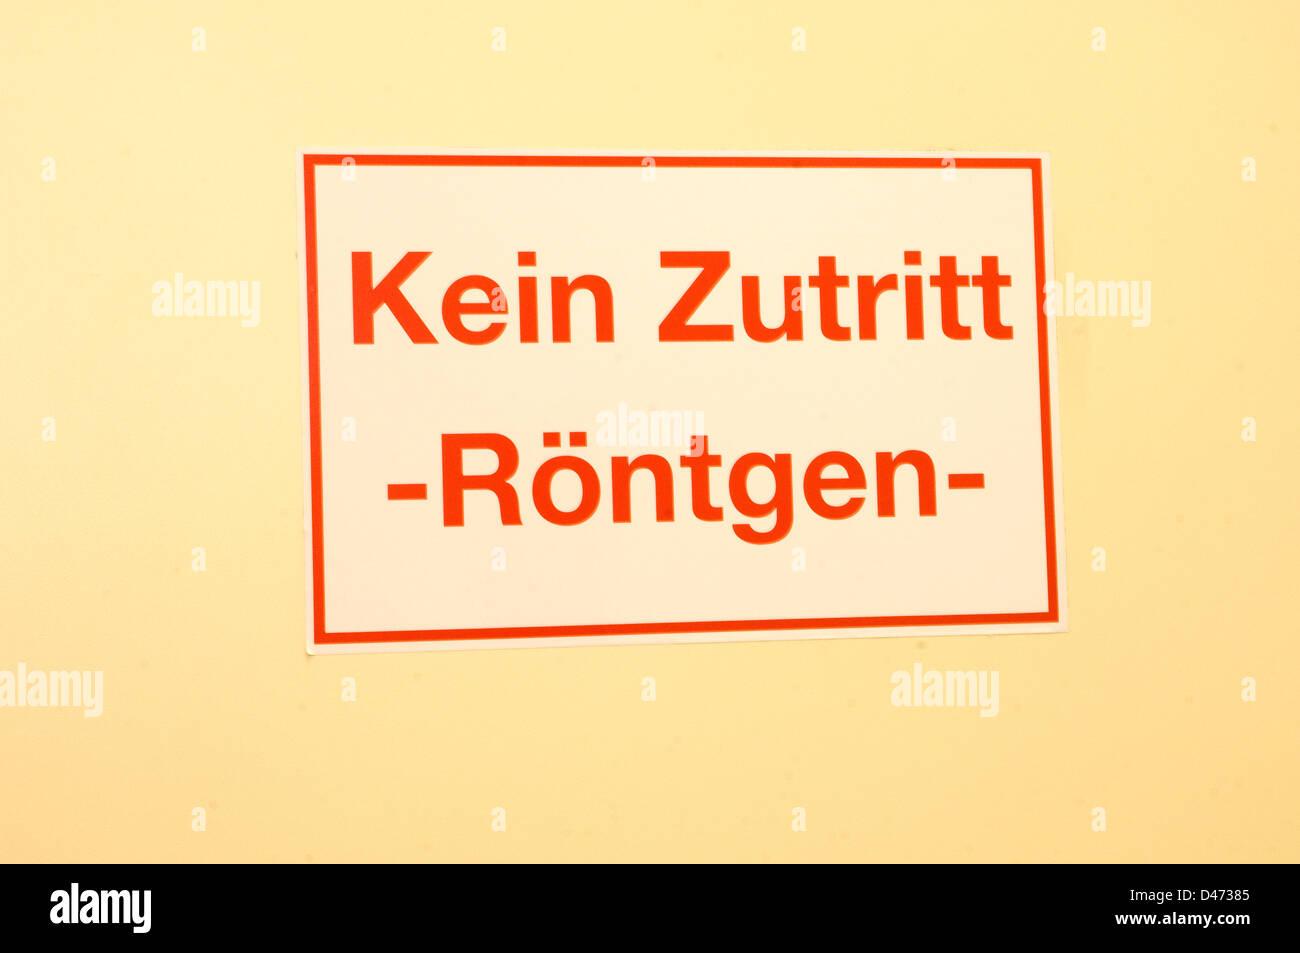 German warning sign 'Kein Zutritt' 'No Access'. - Stock Image